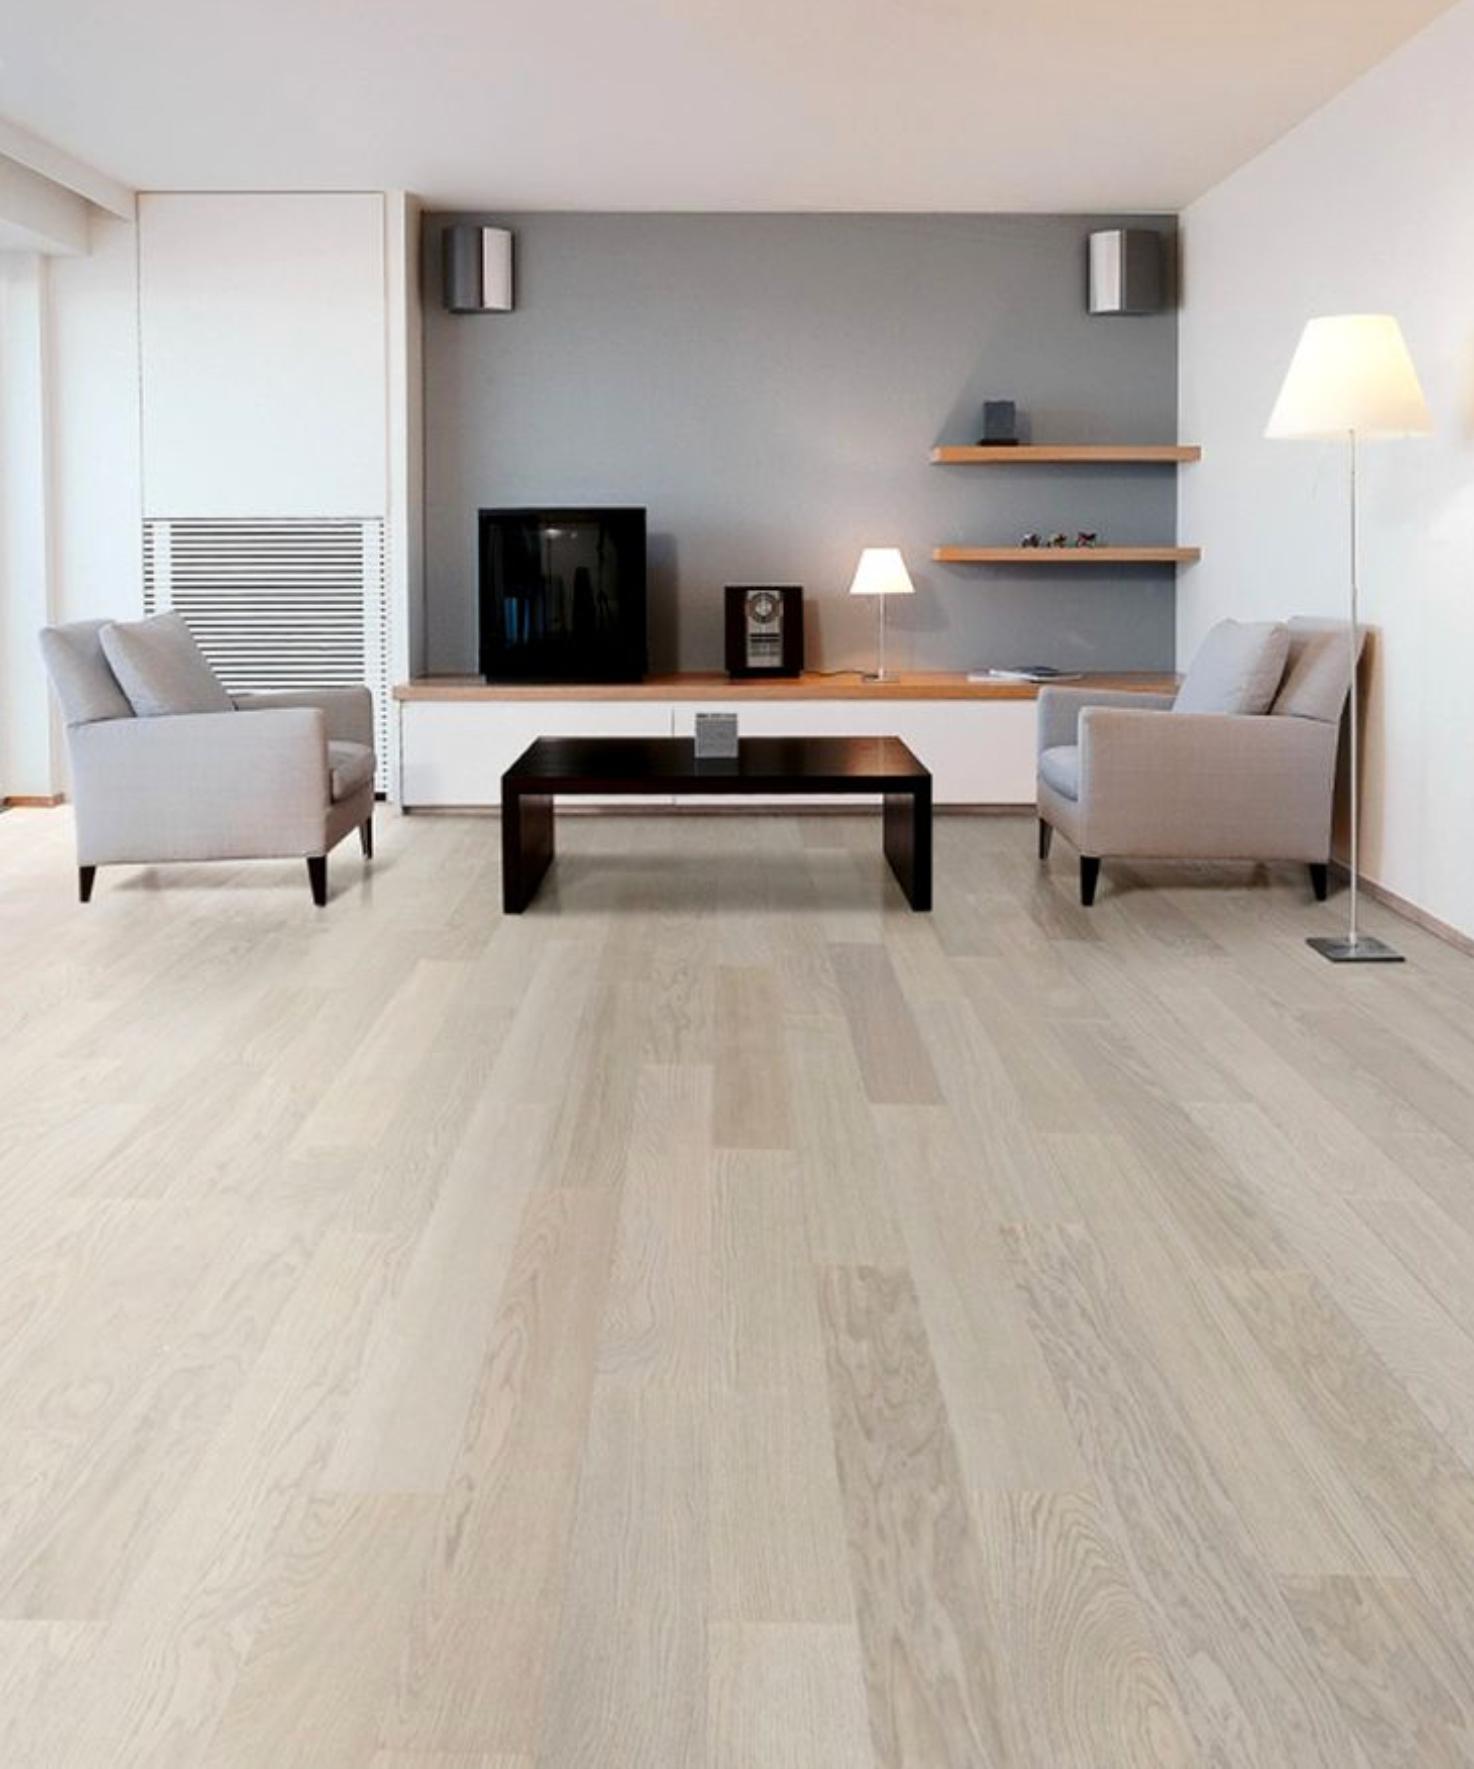 homewise-innovations-wood-flooring-7